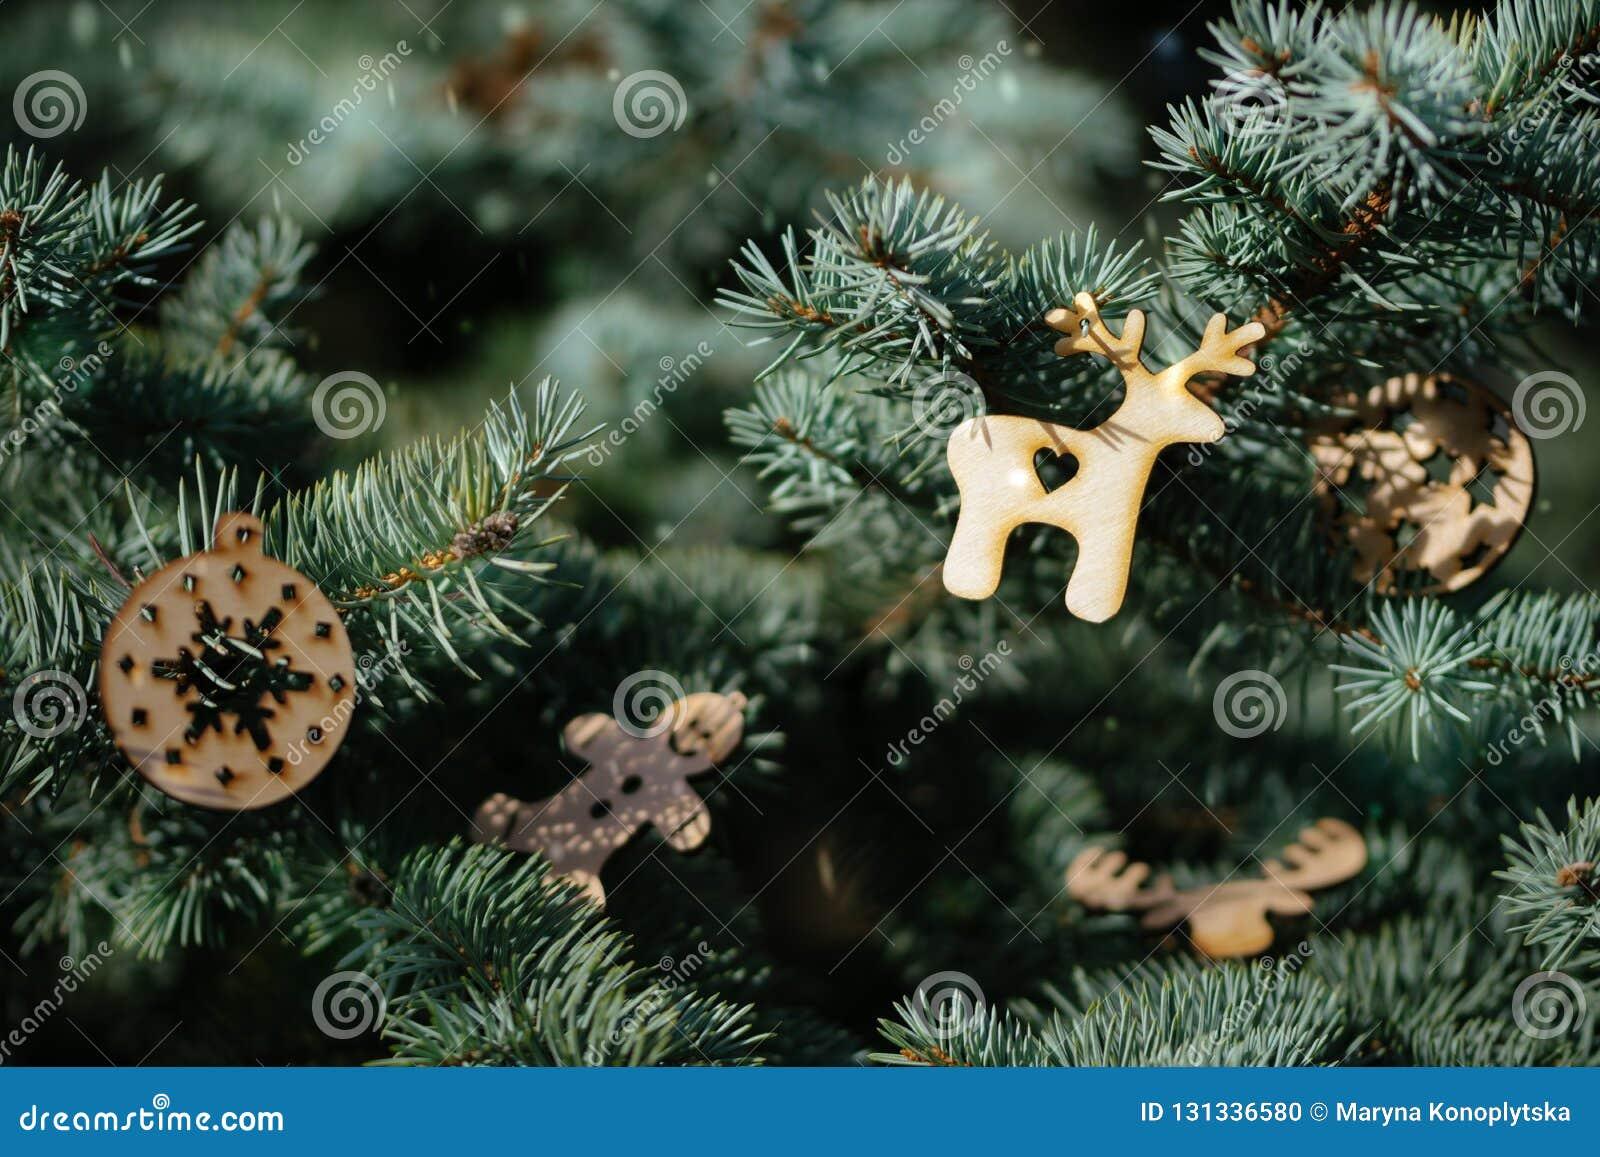 Christmas Tree And Beautiful Christmas Decorations Stock Photo Image Of Festive Decor 131336580